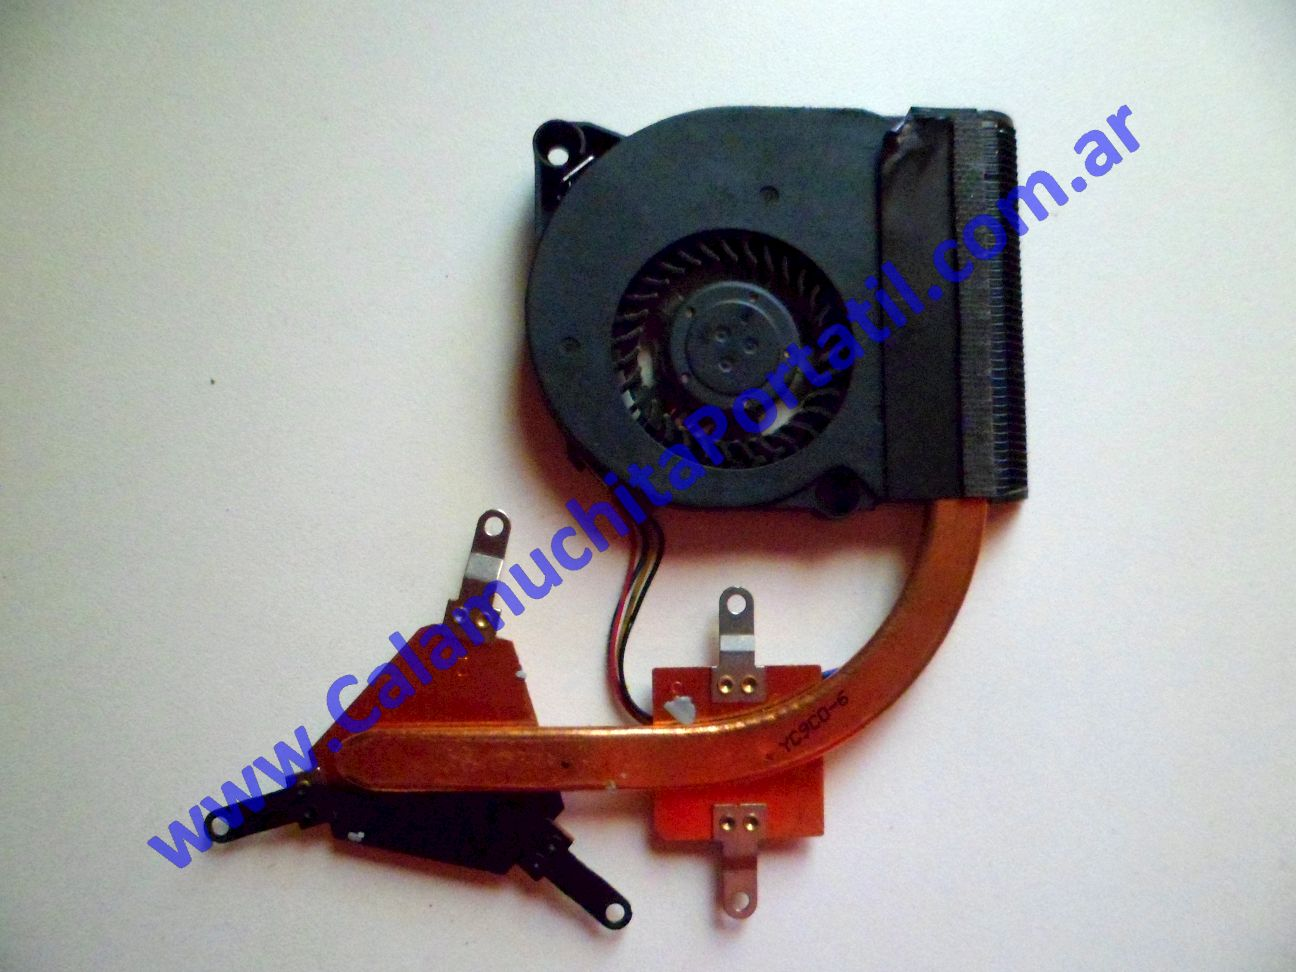 0027VDA Cooler C/Disipador Asus Eee PC 1201n